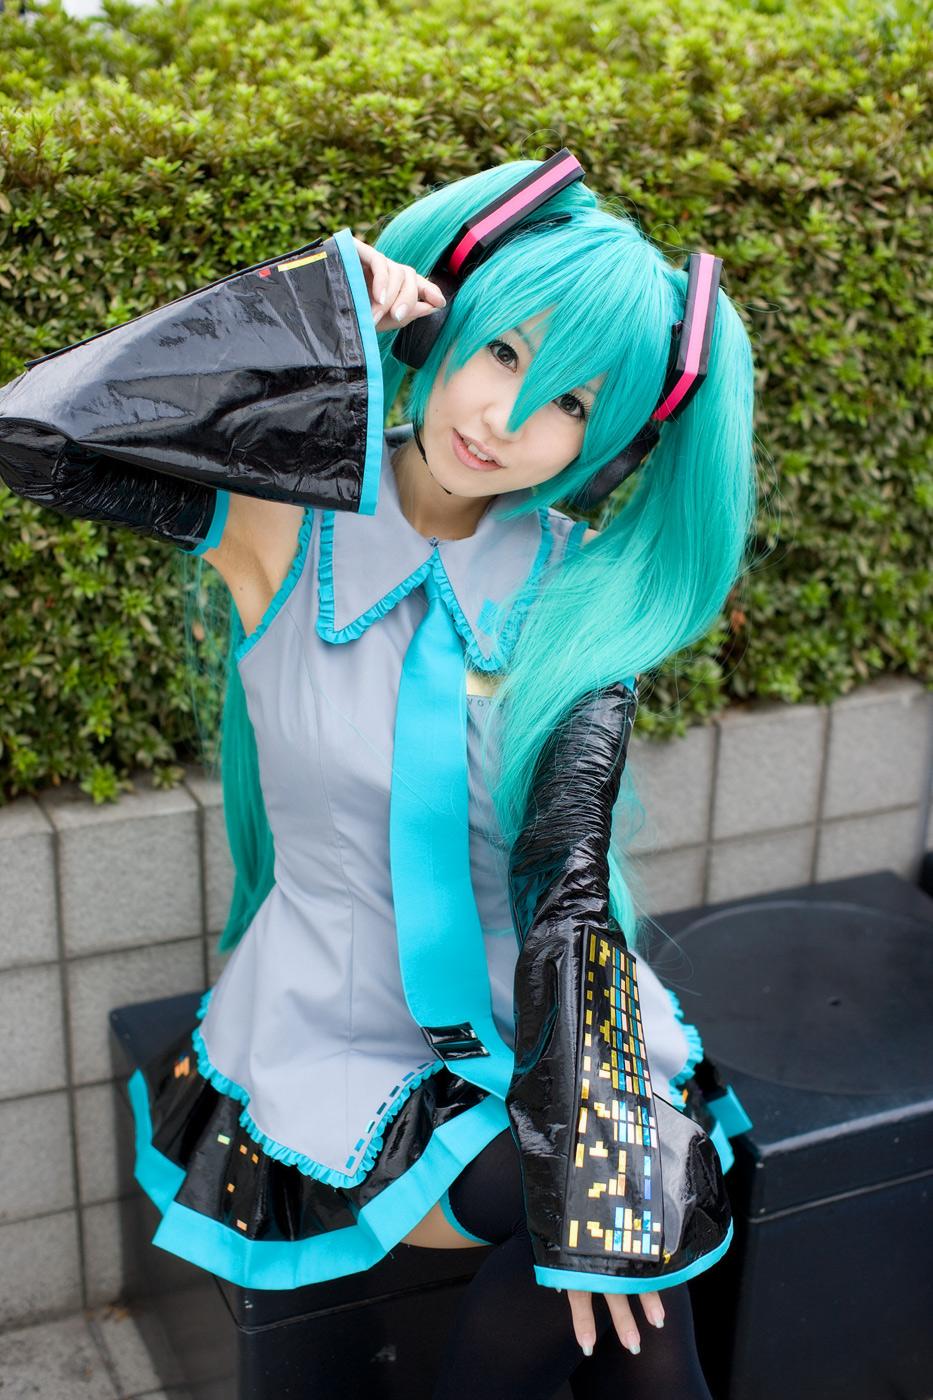 hatsune miku cosplay - photo #1